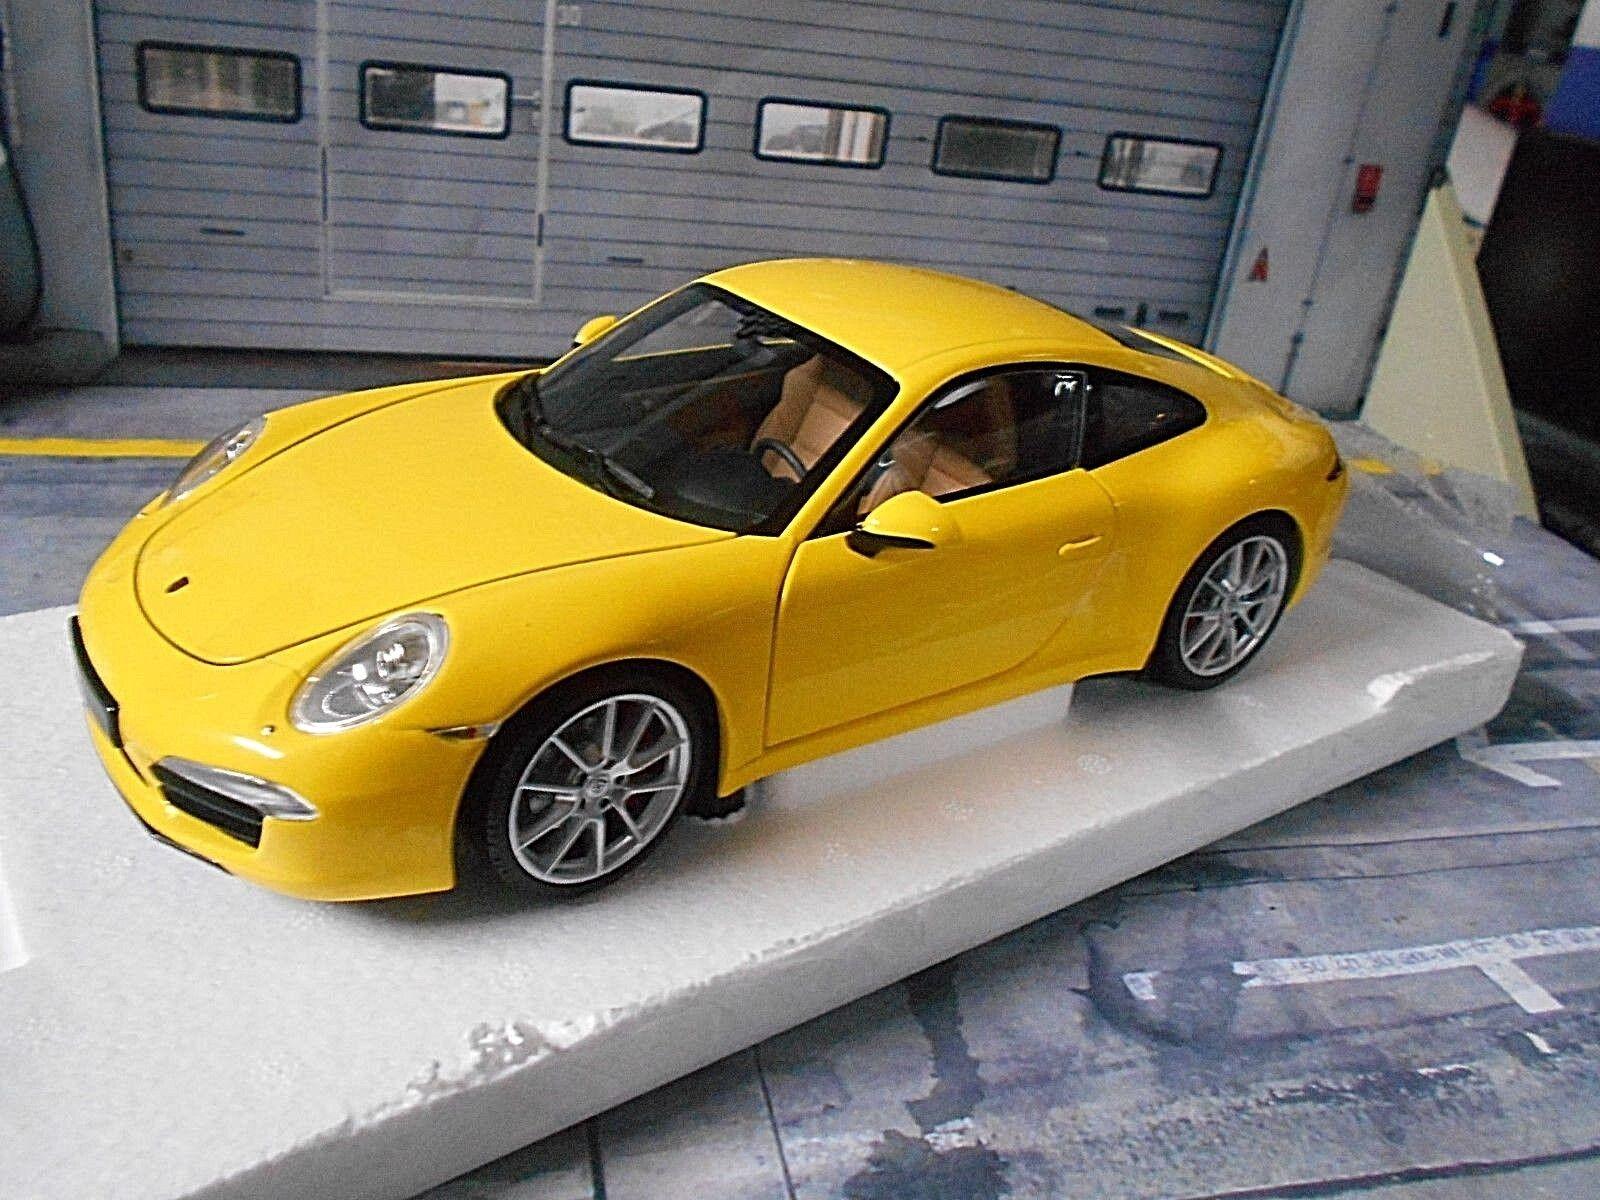 Porsche 911 991 Carrera s Coupe 2011 jaune jaune rare MINICHAMPS 1 18